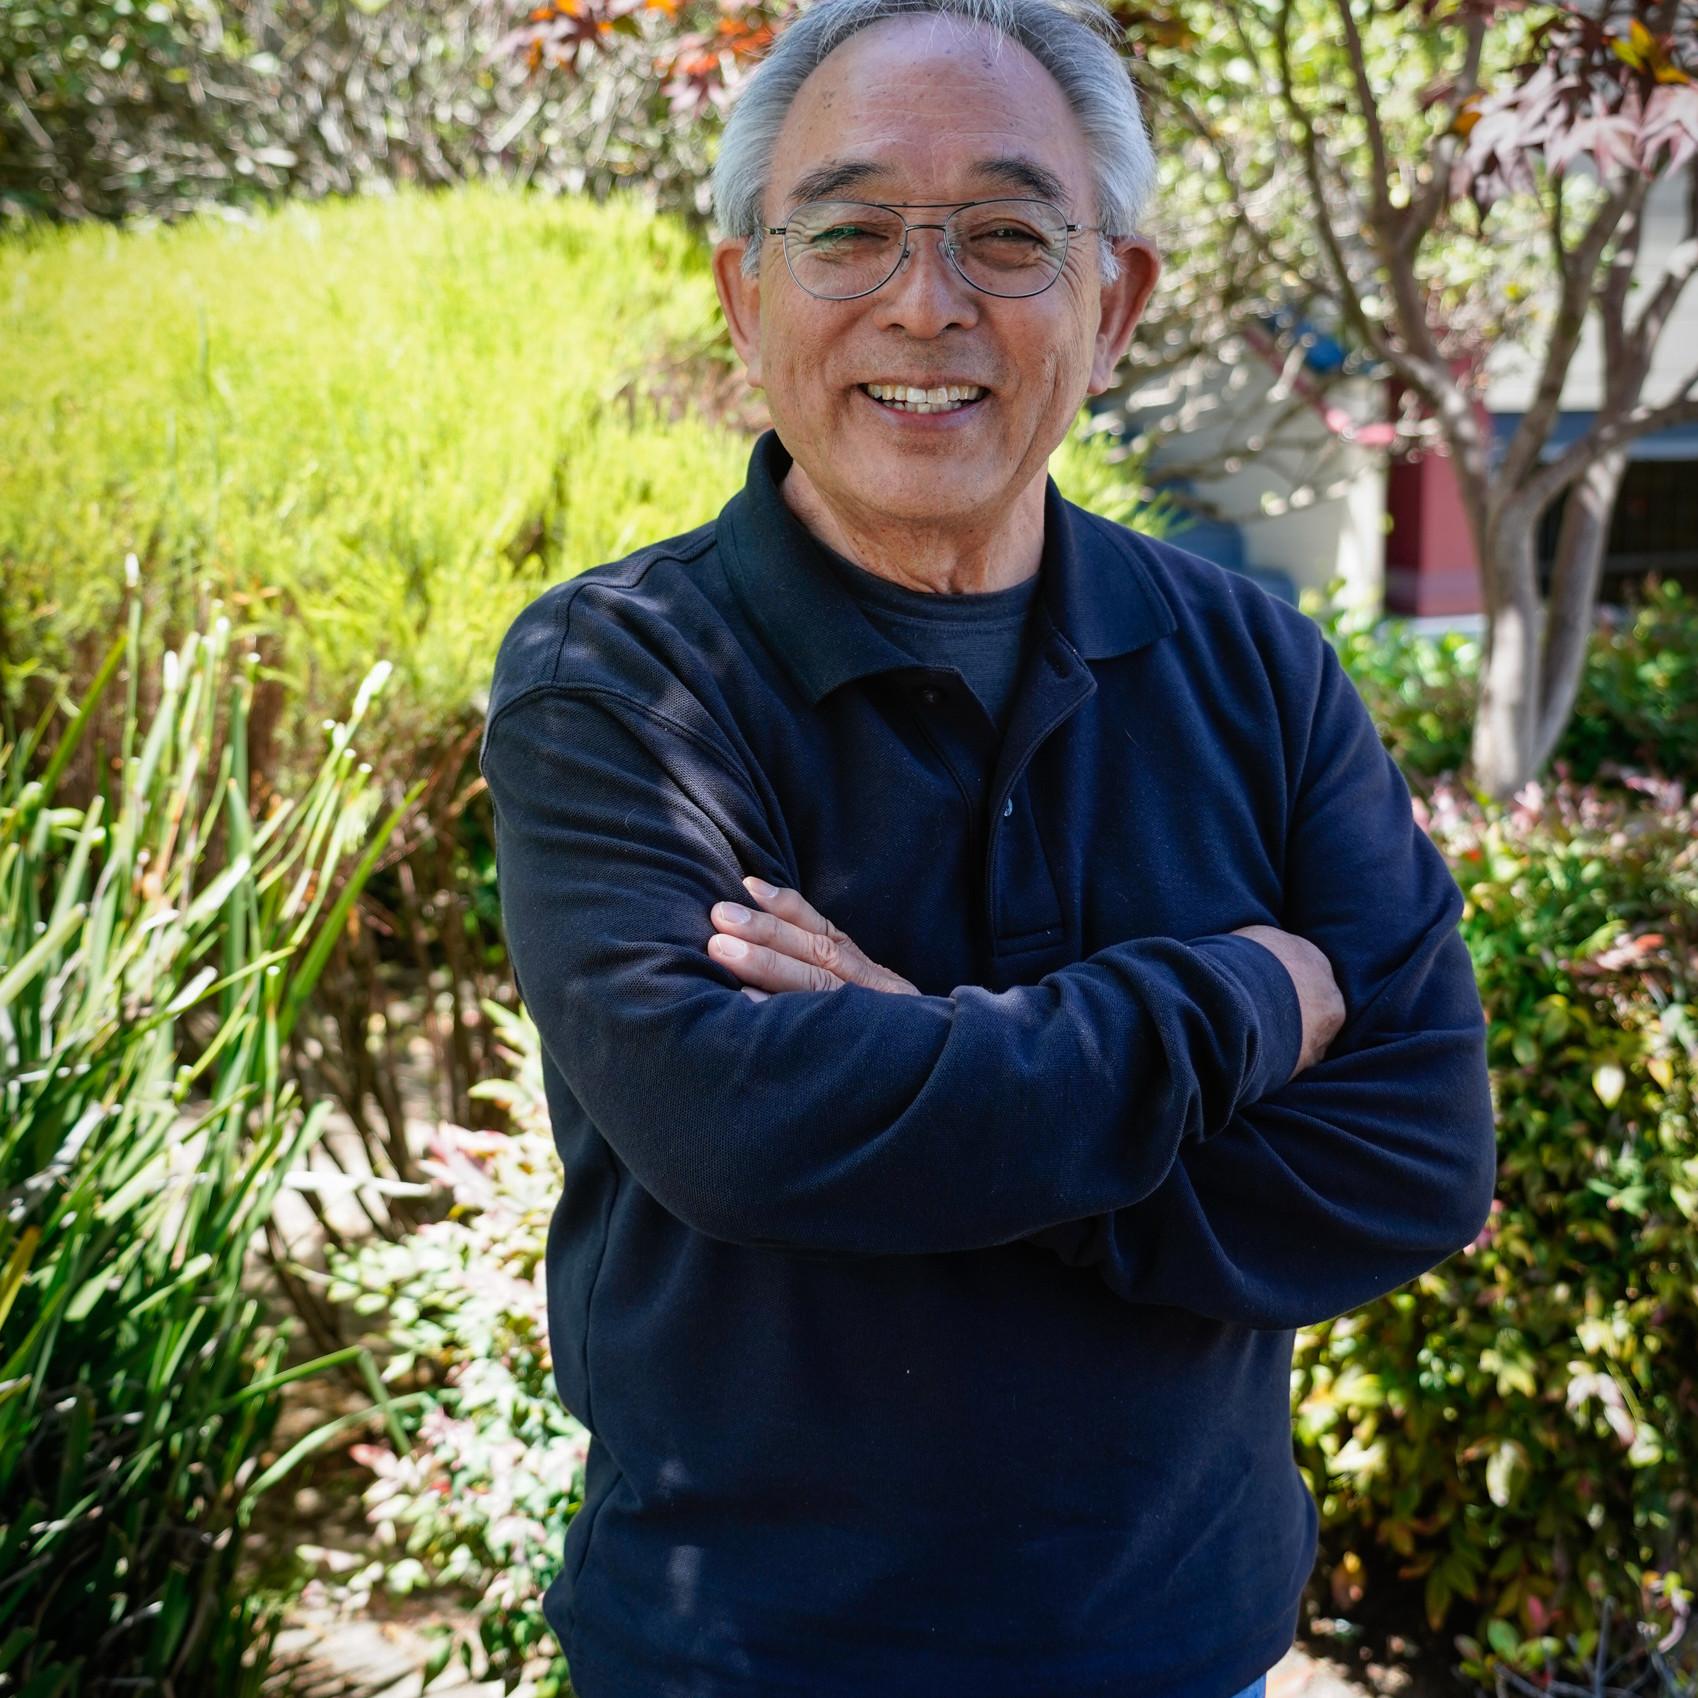 portrait of John Tateishi